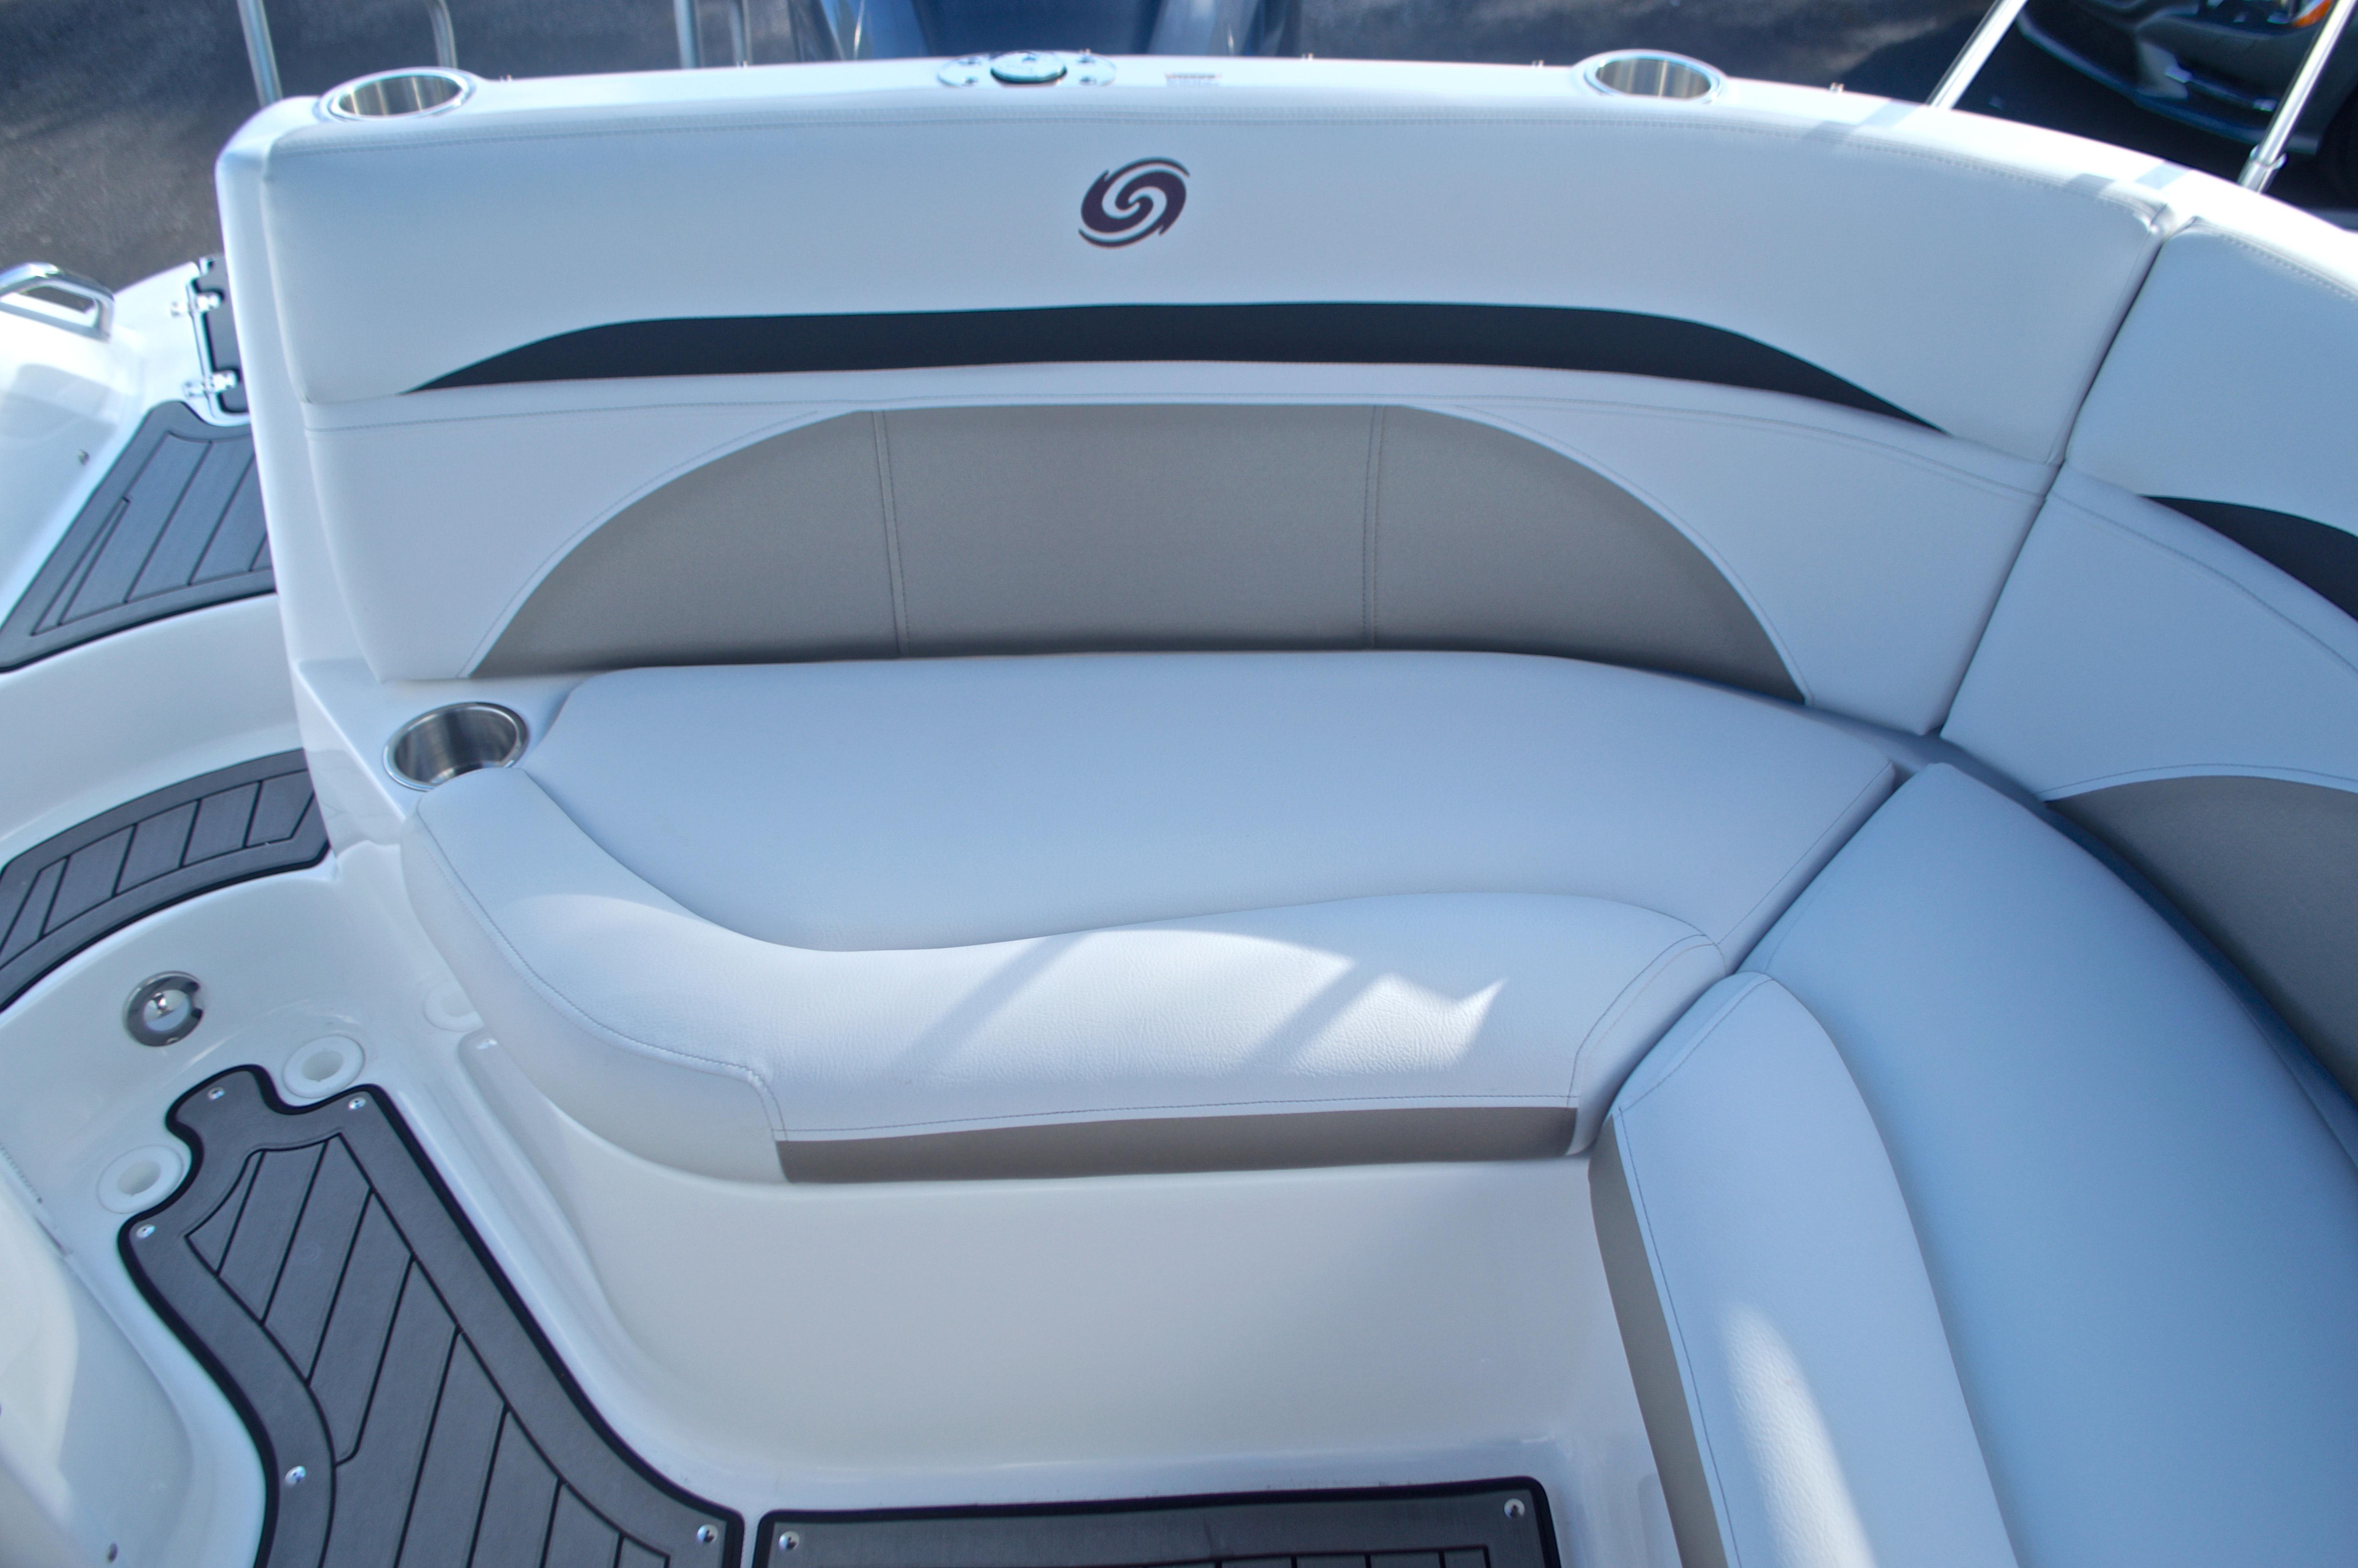 Thumbnail 29 for New 2017 Hurricane SunDeck SD 2400 OB boat for sale in Miami, FL